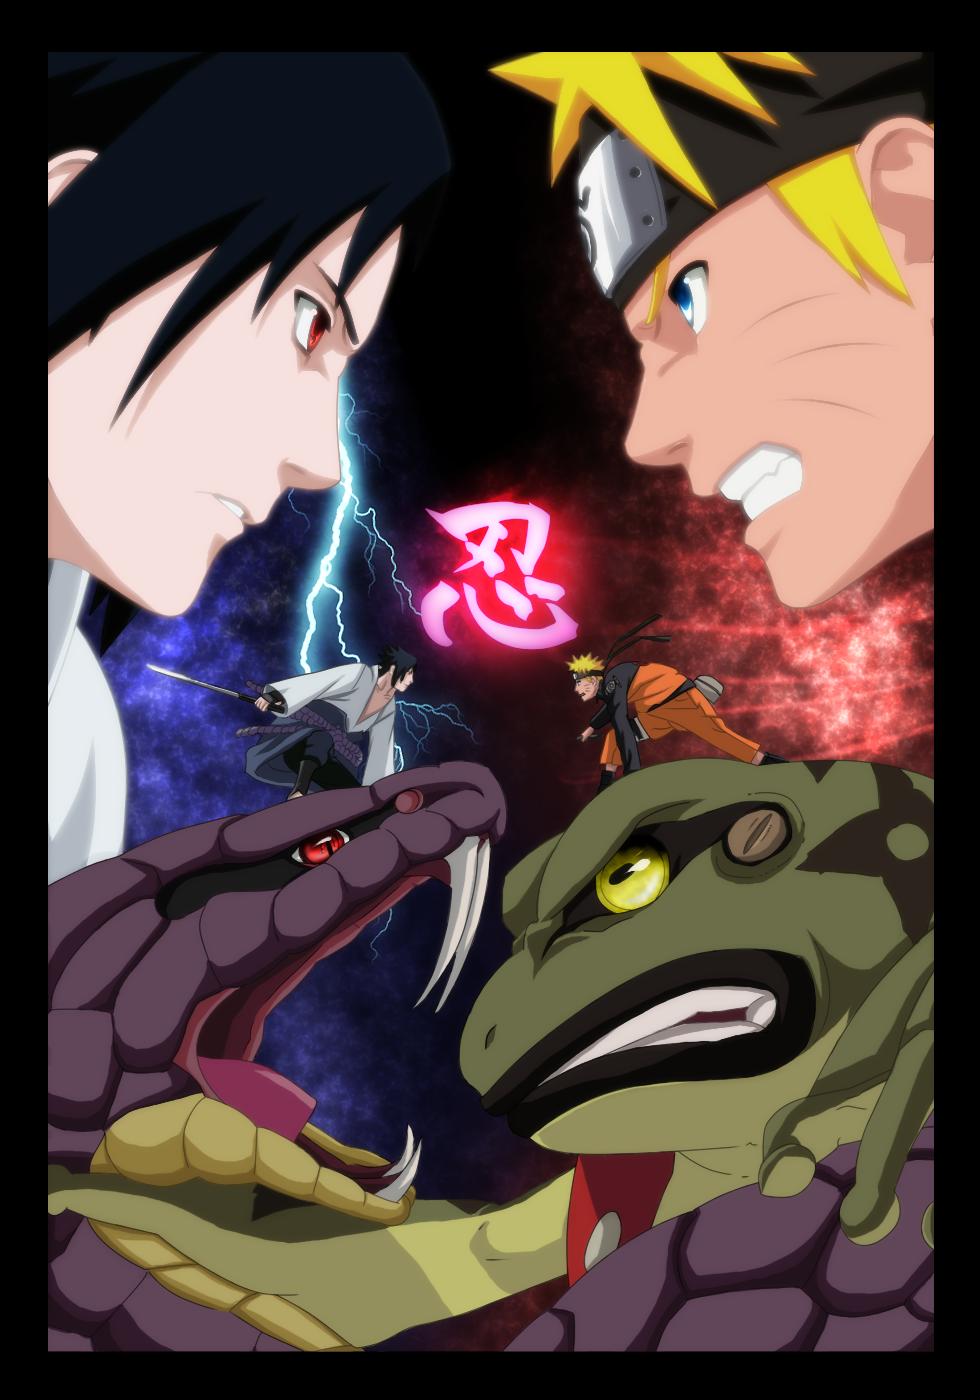 http://fc07.deviantart.net/fs25/f/2008/100/4/9/Sasuke_Vs__Naruto__D_by_Mel13.png